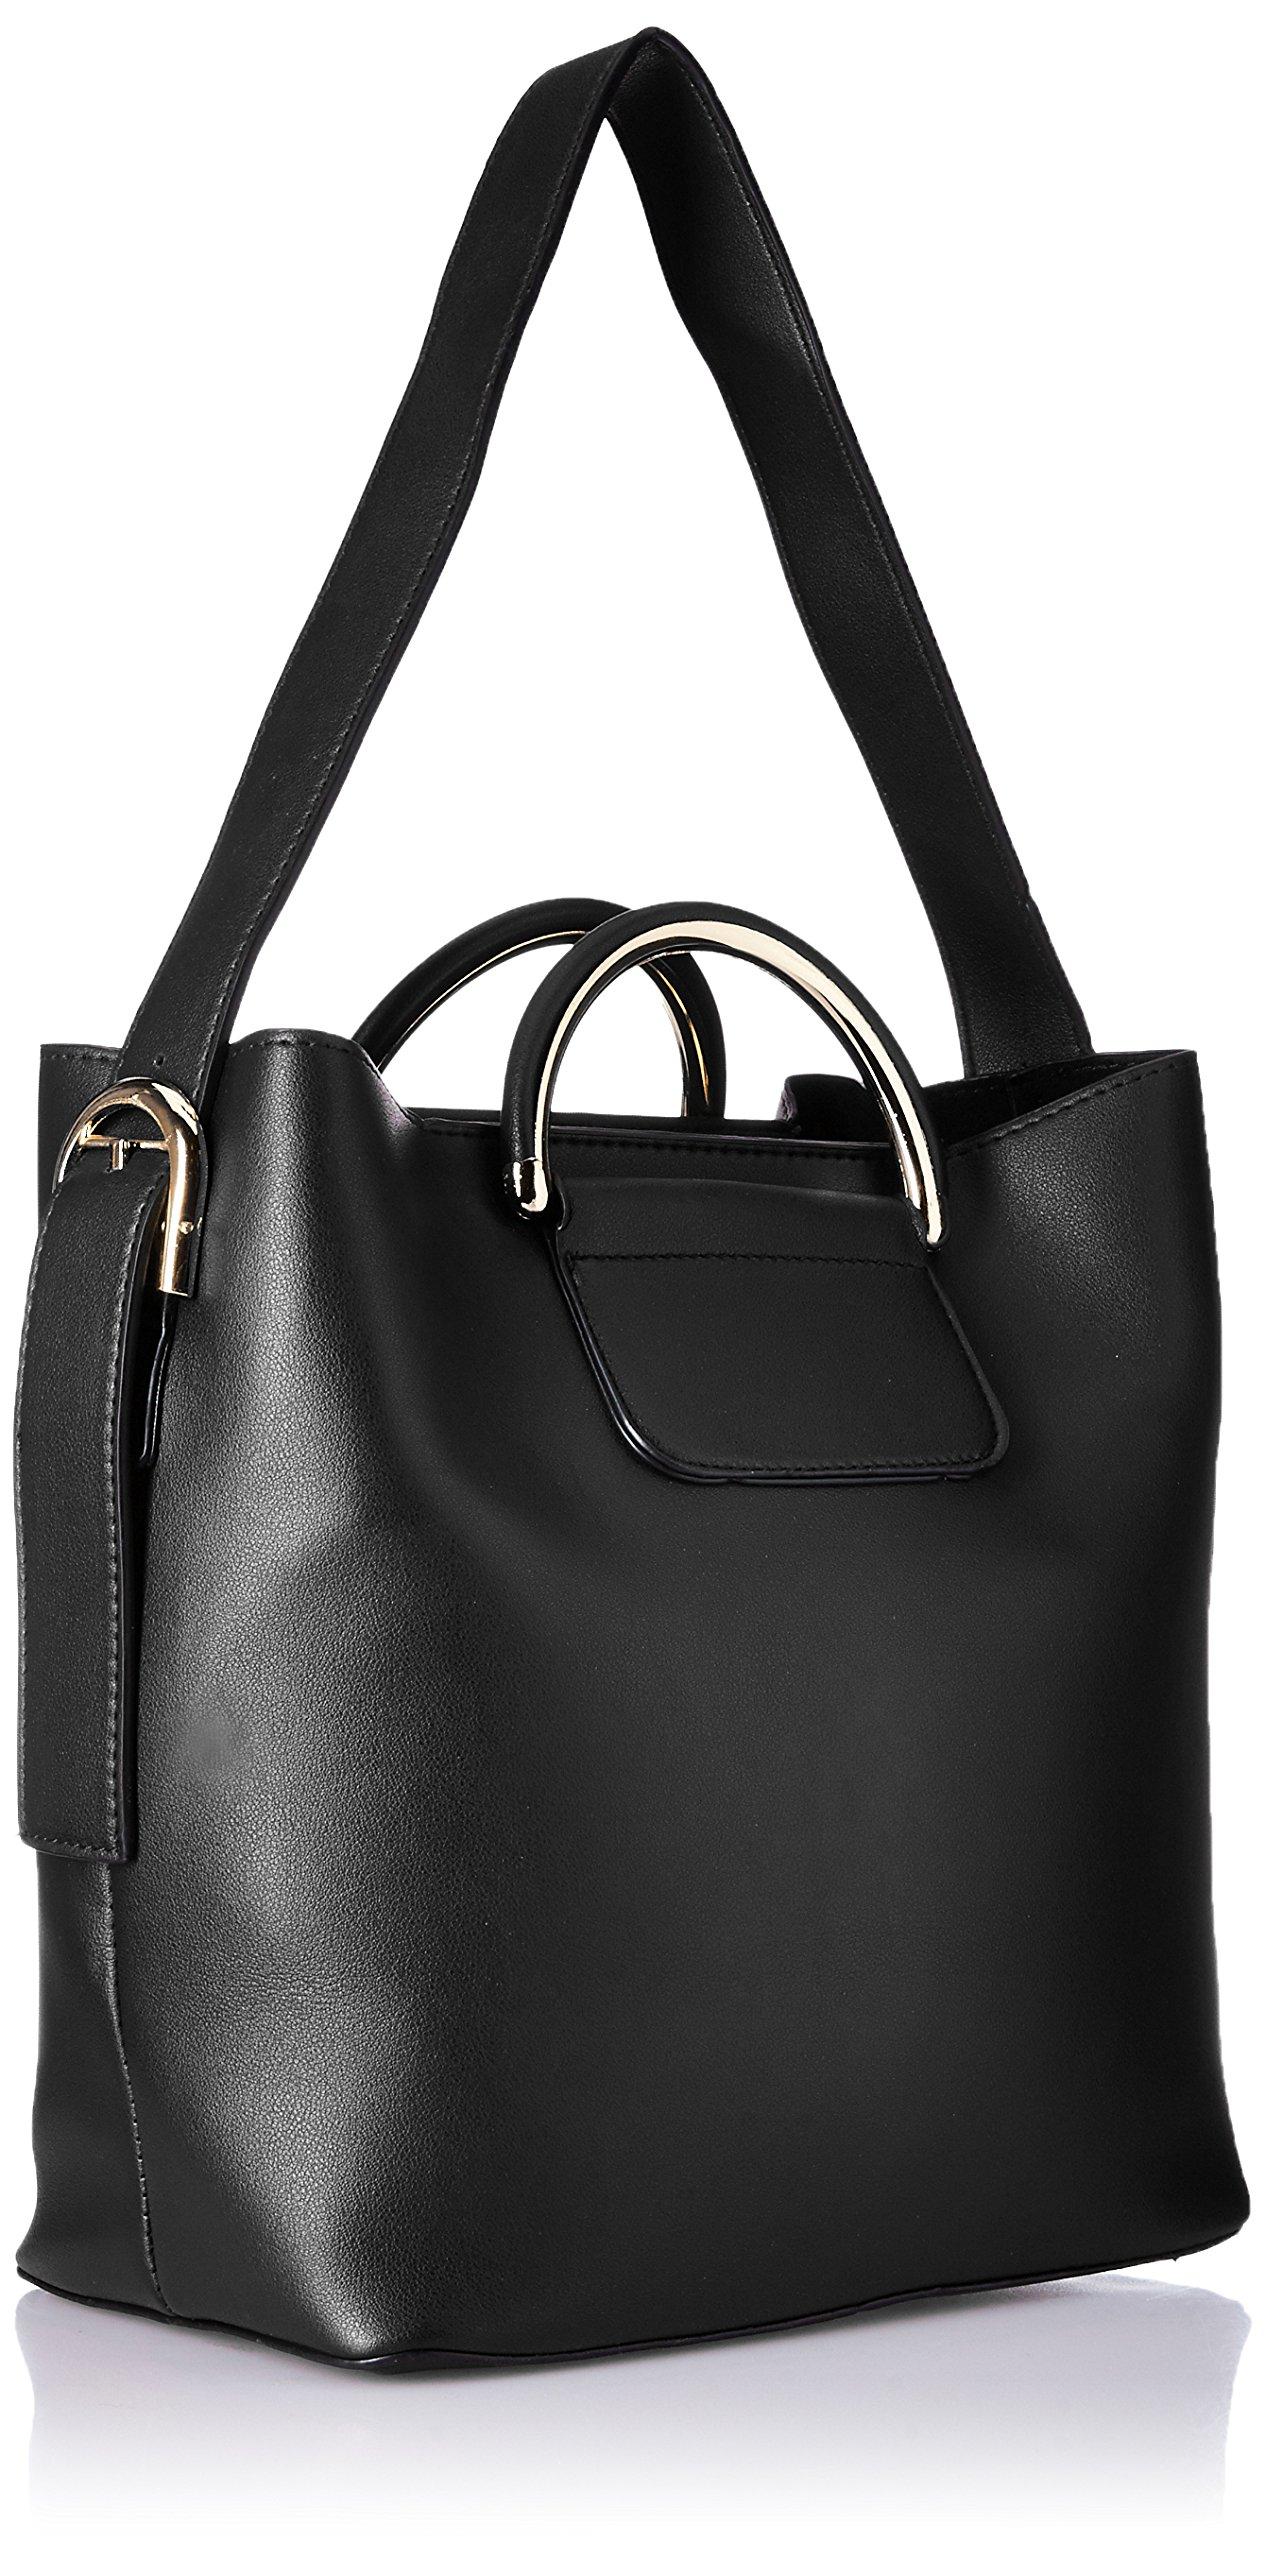 c1573e19f6 Alessia74 Women s Handbag (Black) () - lali mix india